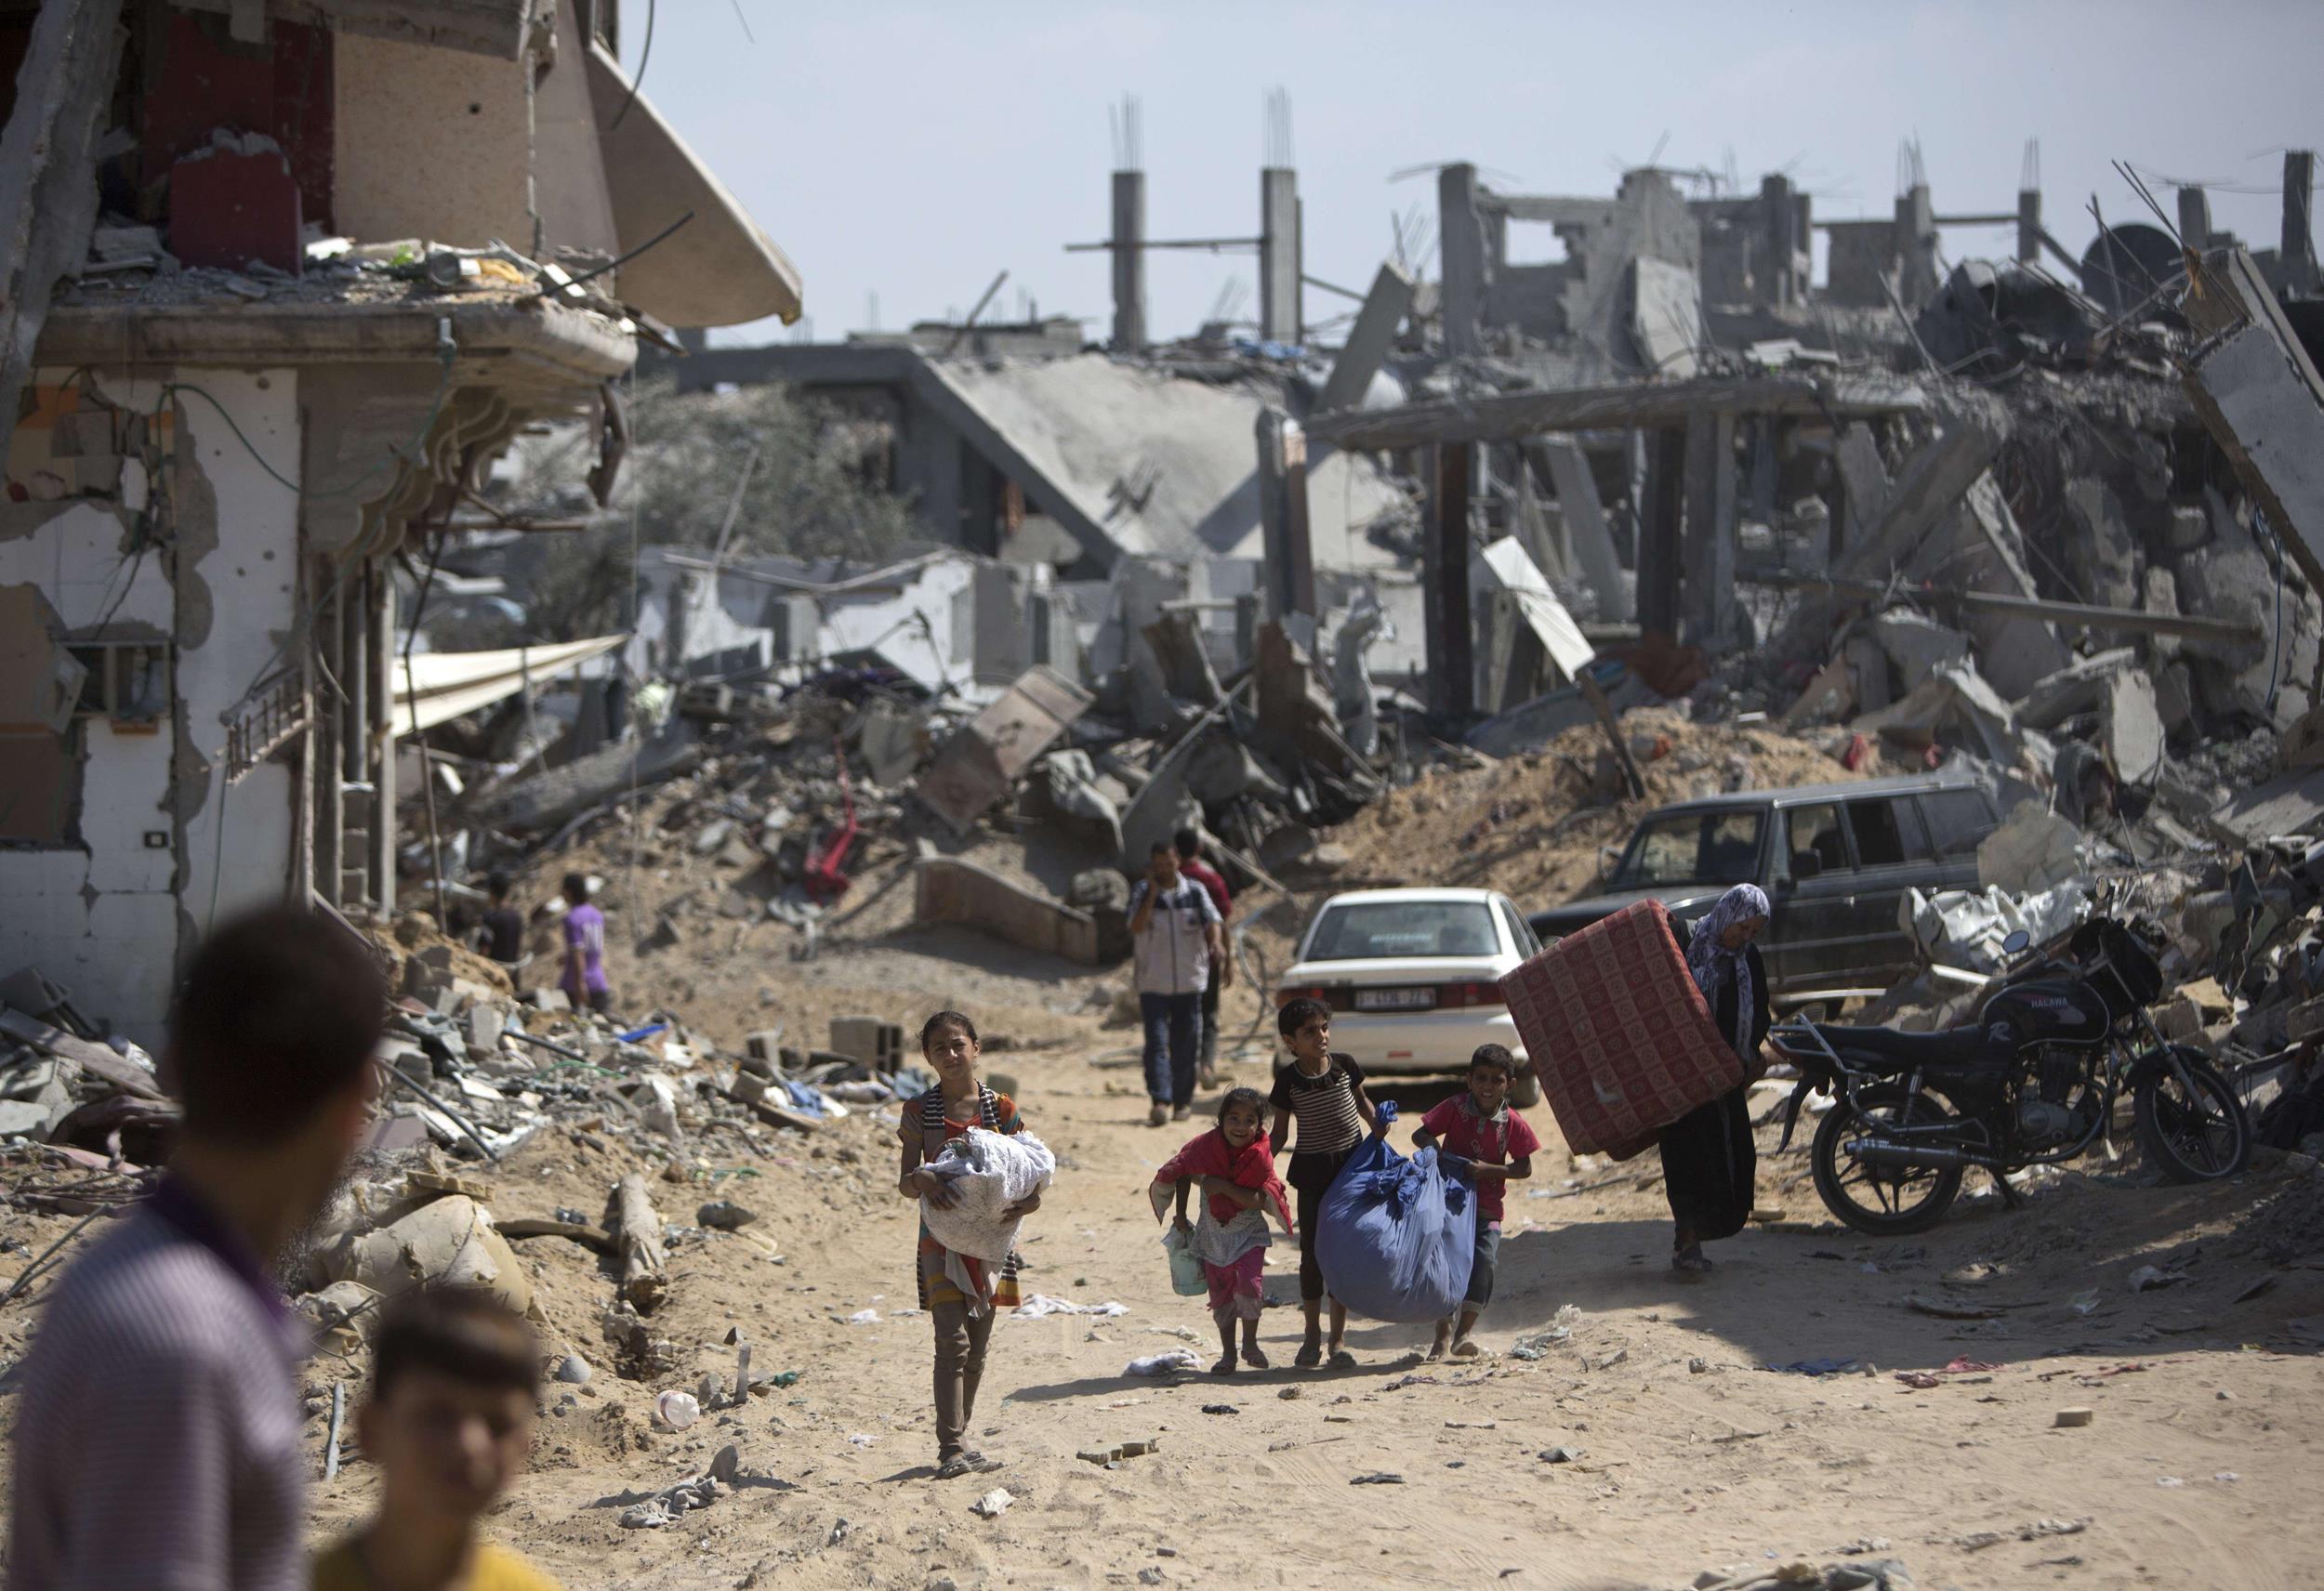 Image: PALESTINIANS-ISRAEL-CONFLICT-GAZA